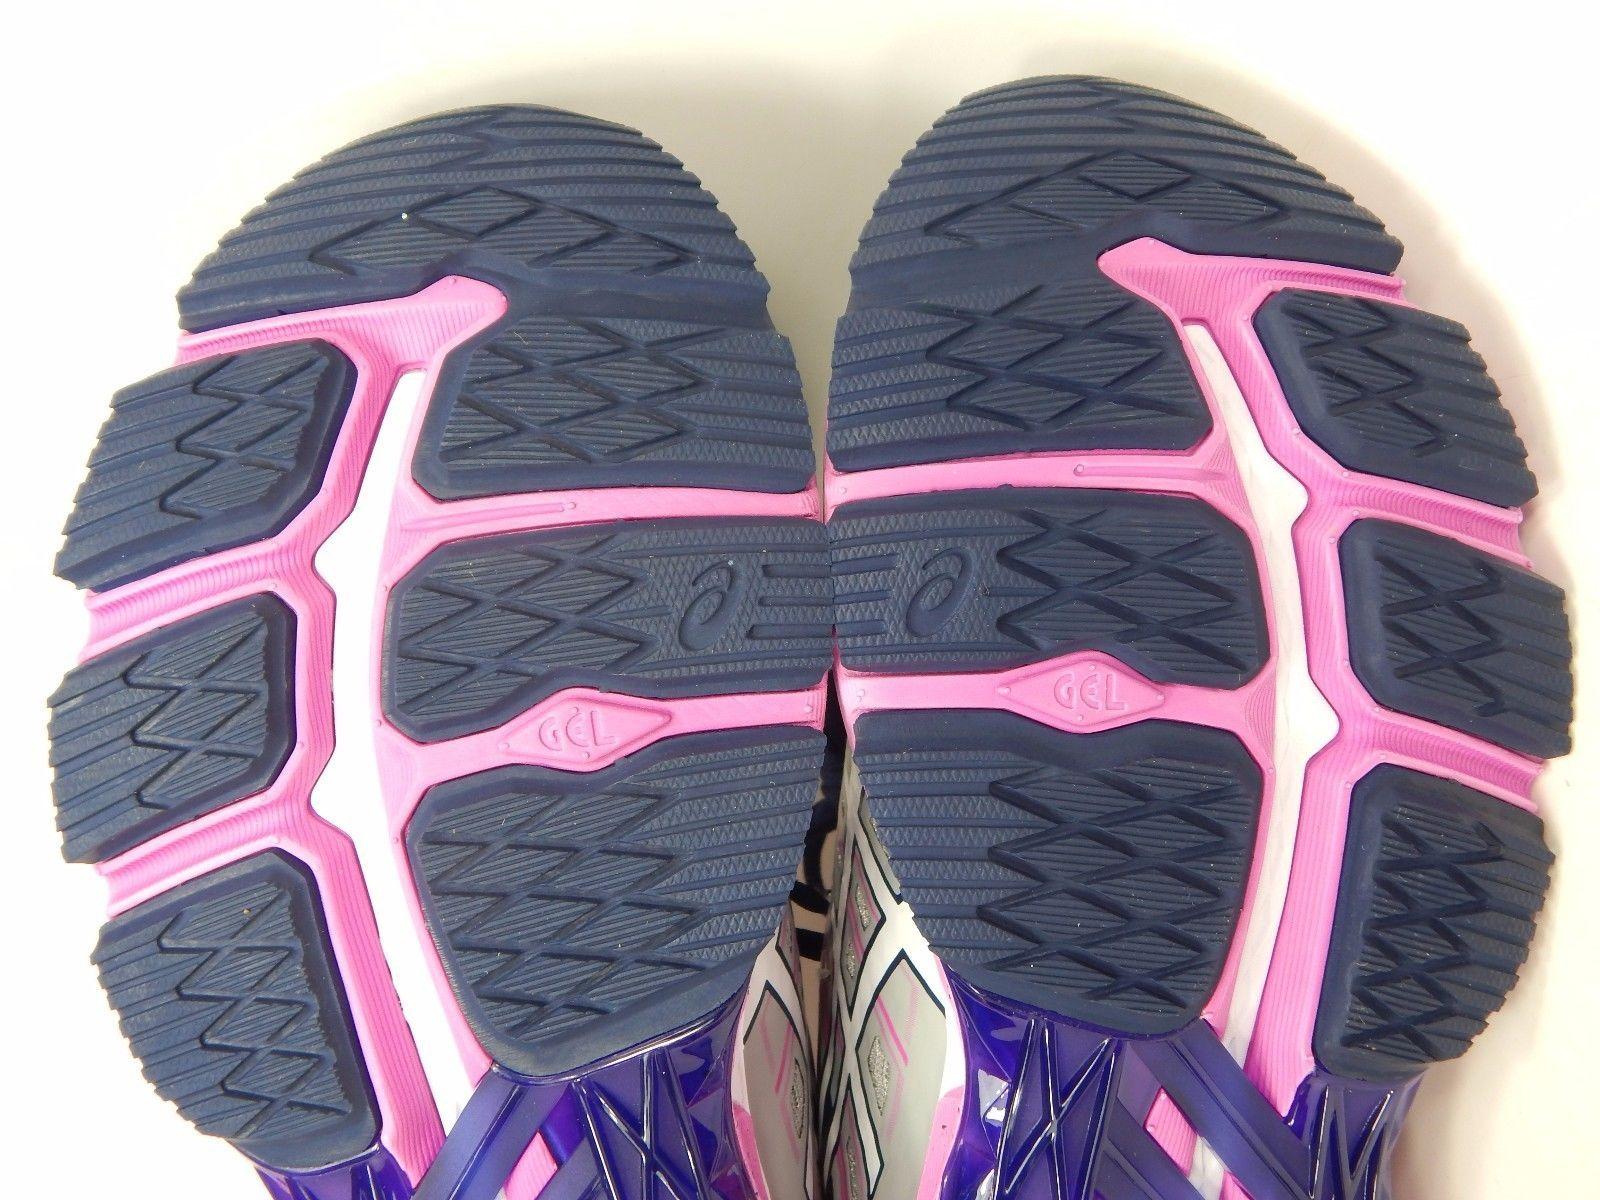 Asics GT 2000 v 5 Women's Running Shoes Size US 9 M (B) EU 40.5 Silver T757N